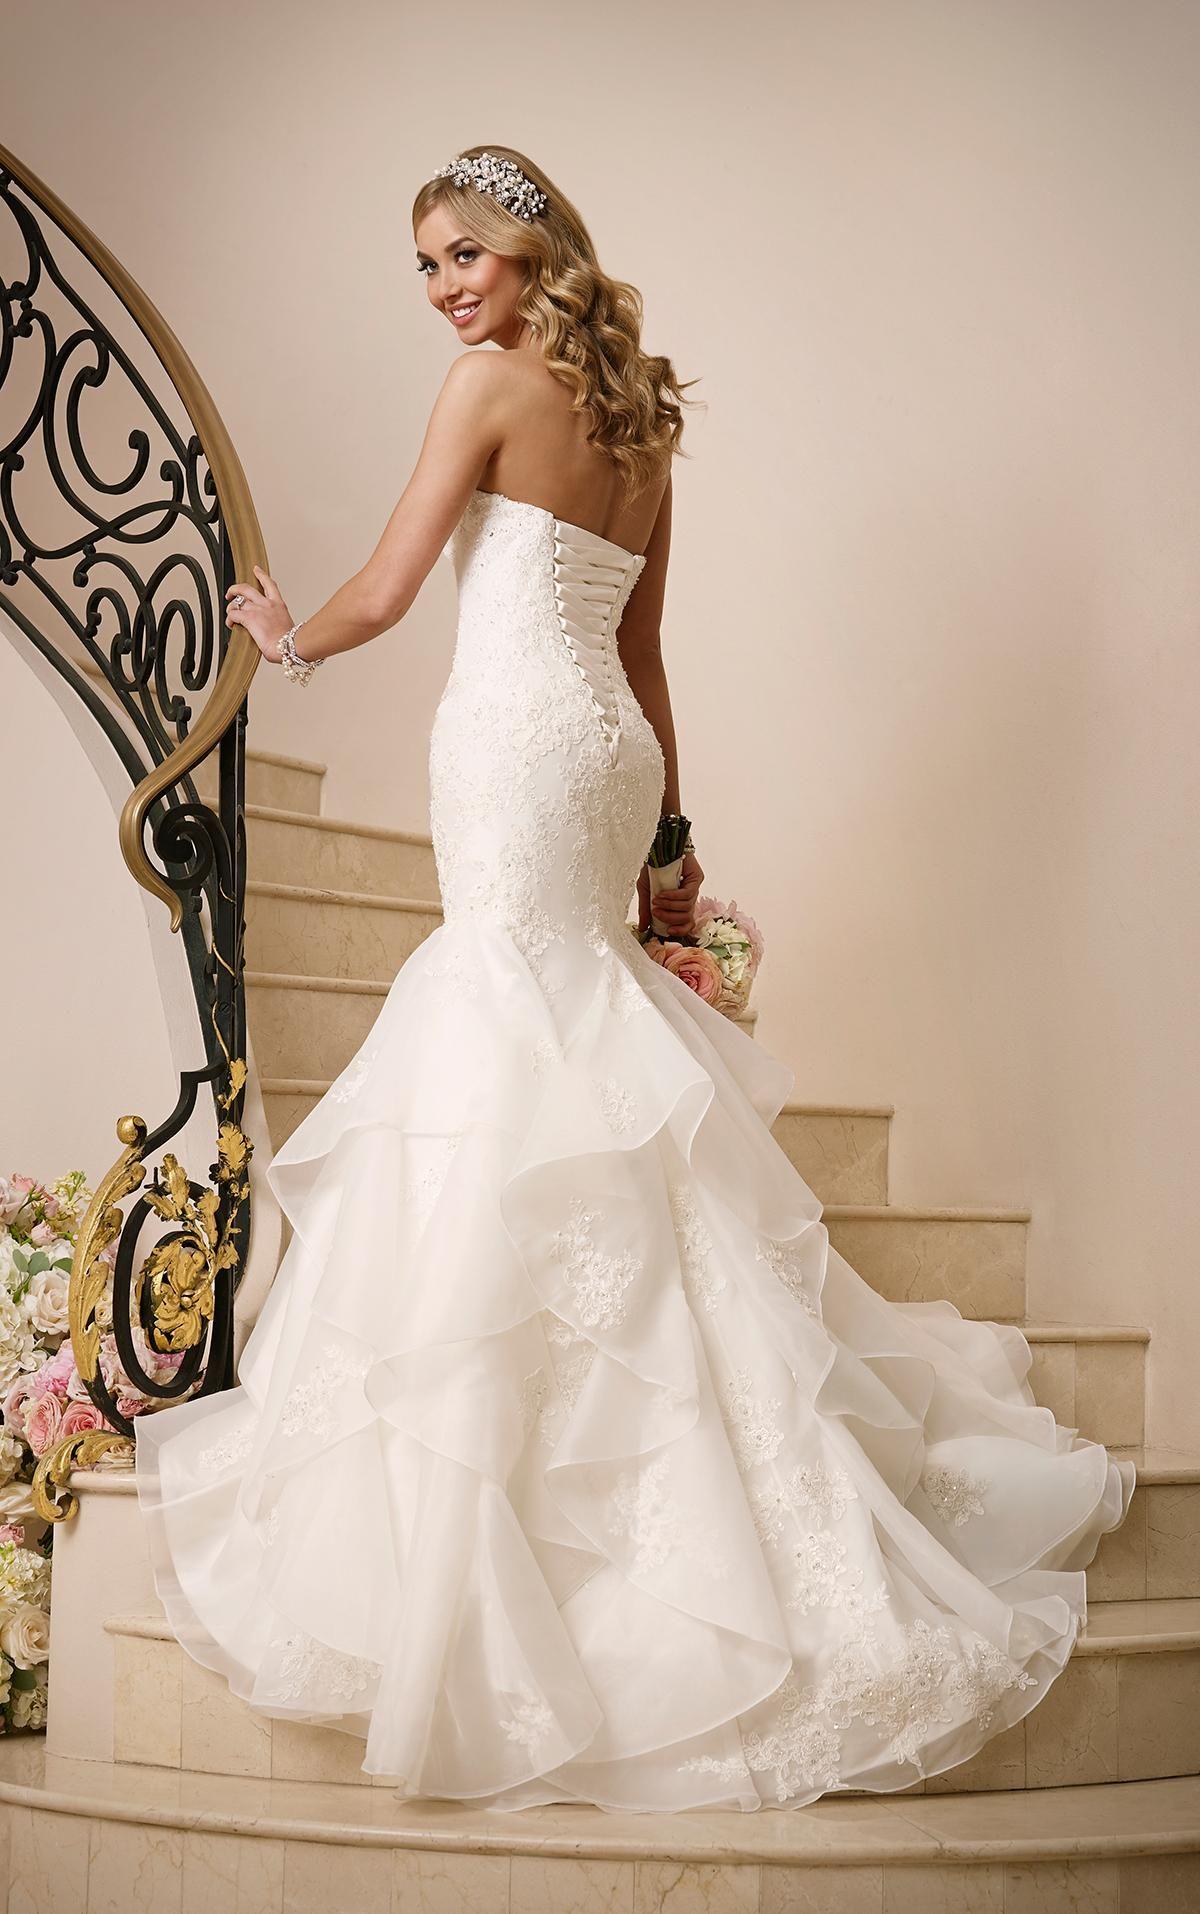 Pin On 2020 Wedding Dresses [ 1914 x 1200 Pixel ]